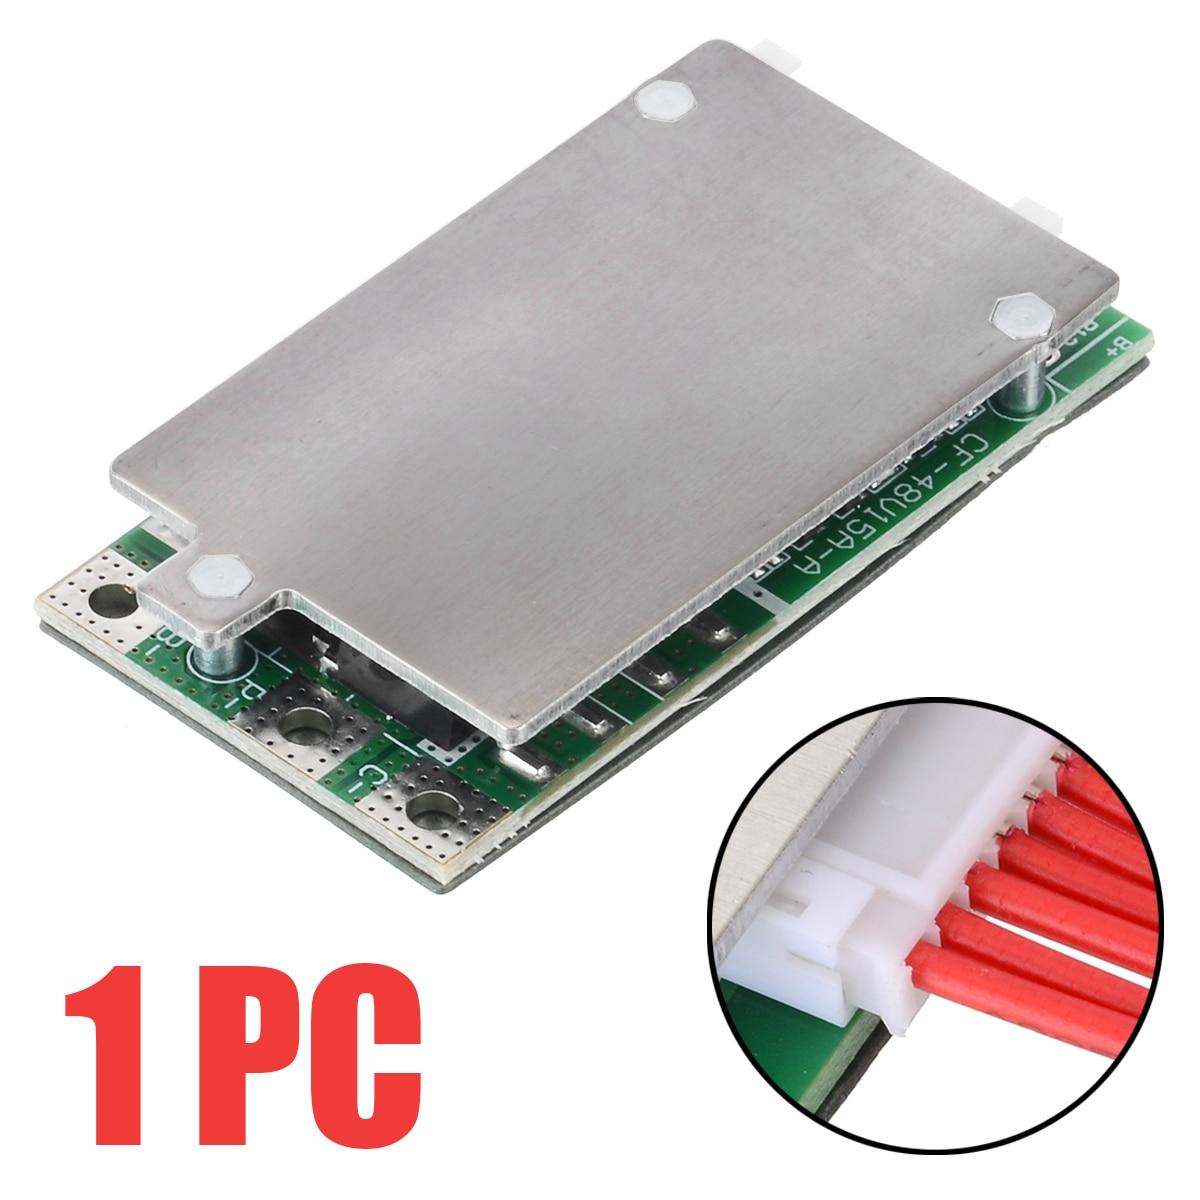 Mayitr 10S 36V 37V 15A литий-ионная батарея защита питания литиевые батареи BMS PCB PCM подходит для электровелосипеда